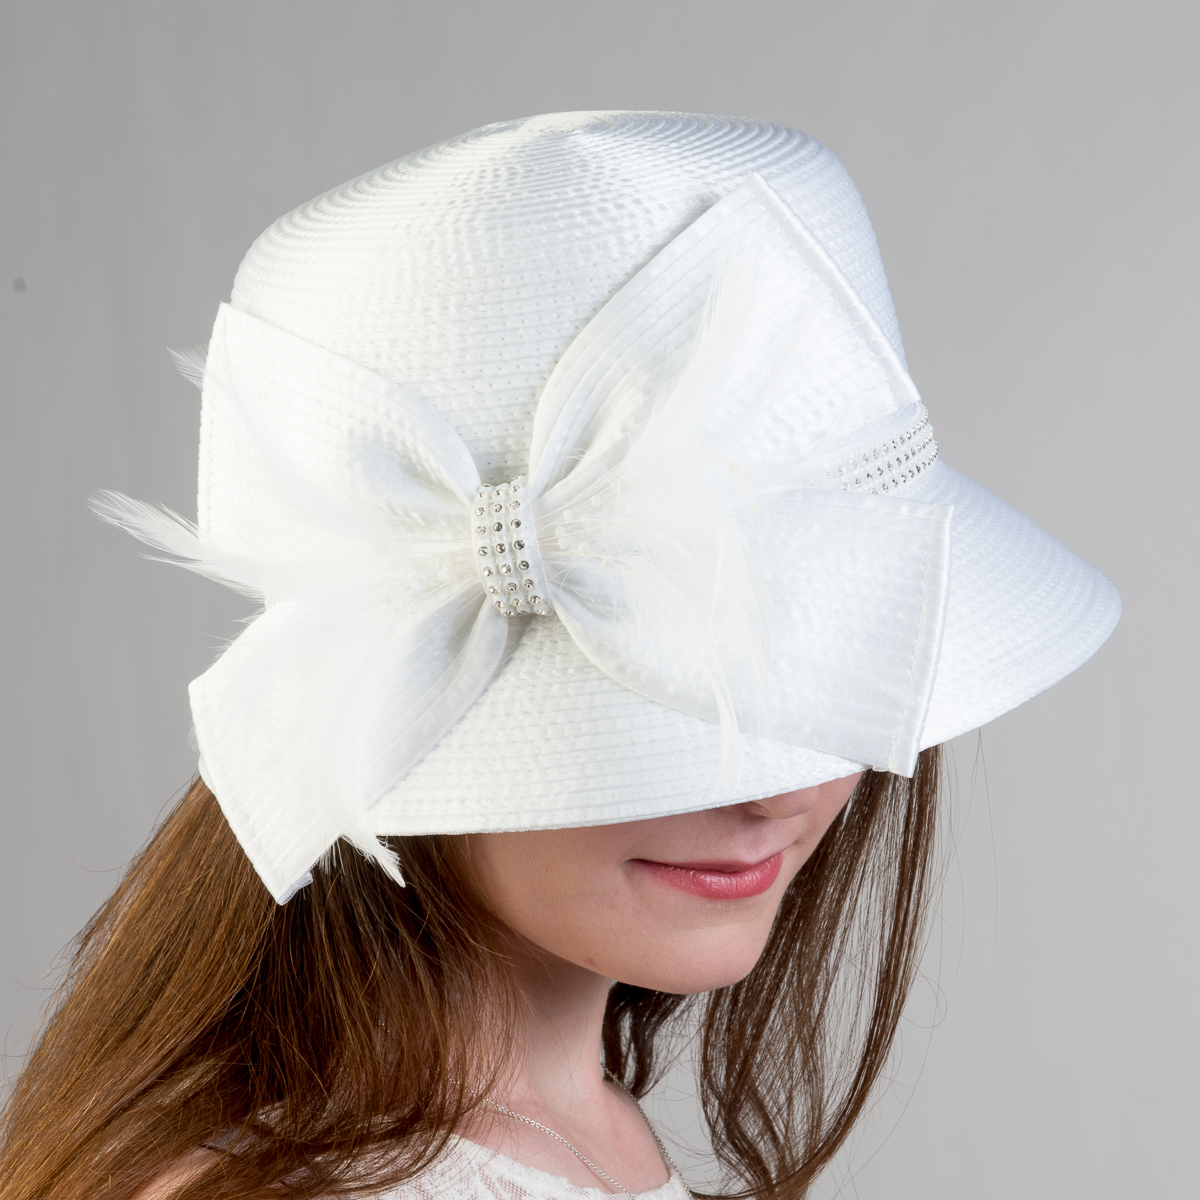 ebaa70a919f White Father And Rhinestone Satin Metallic Bucket Hats-321777-WT ...